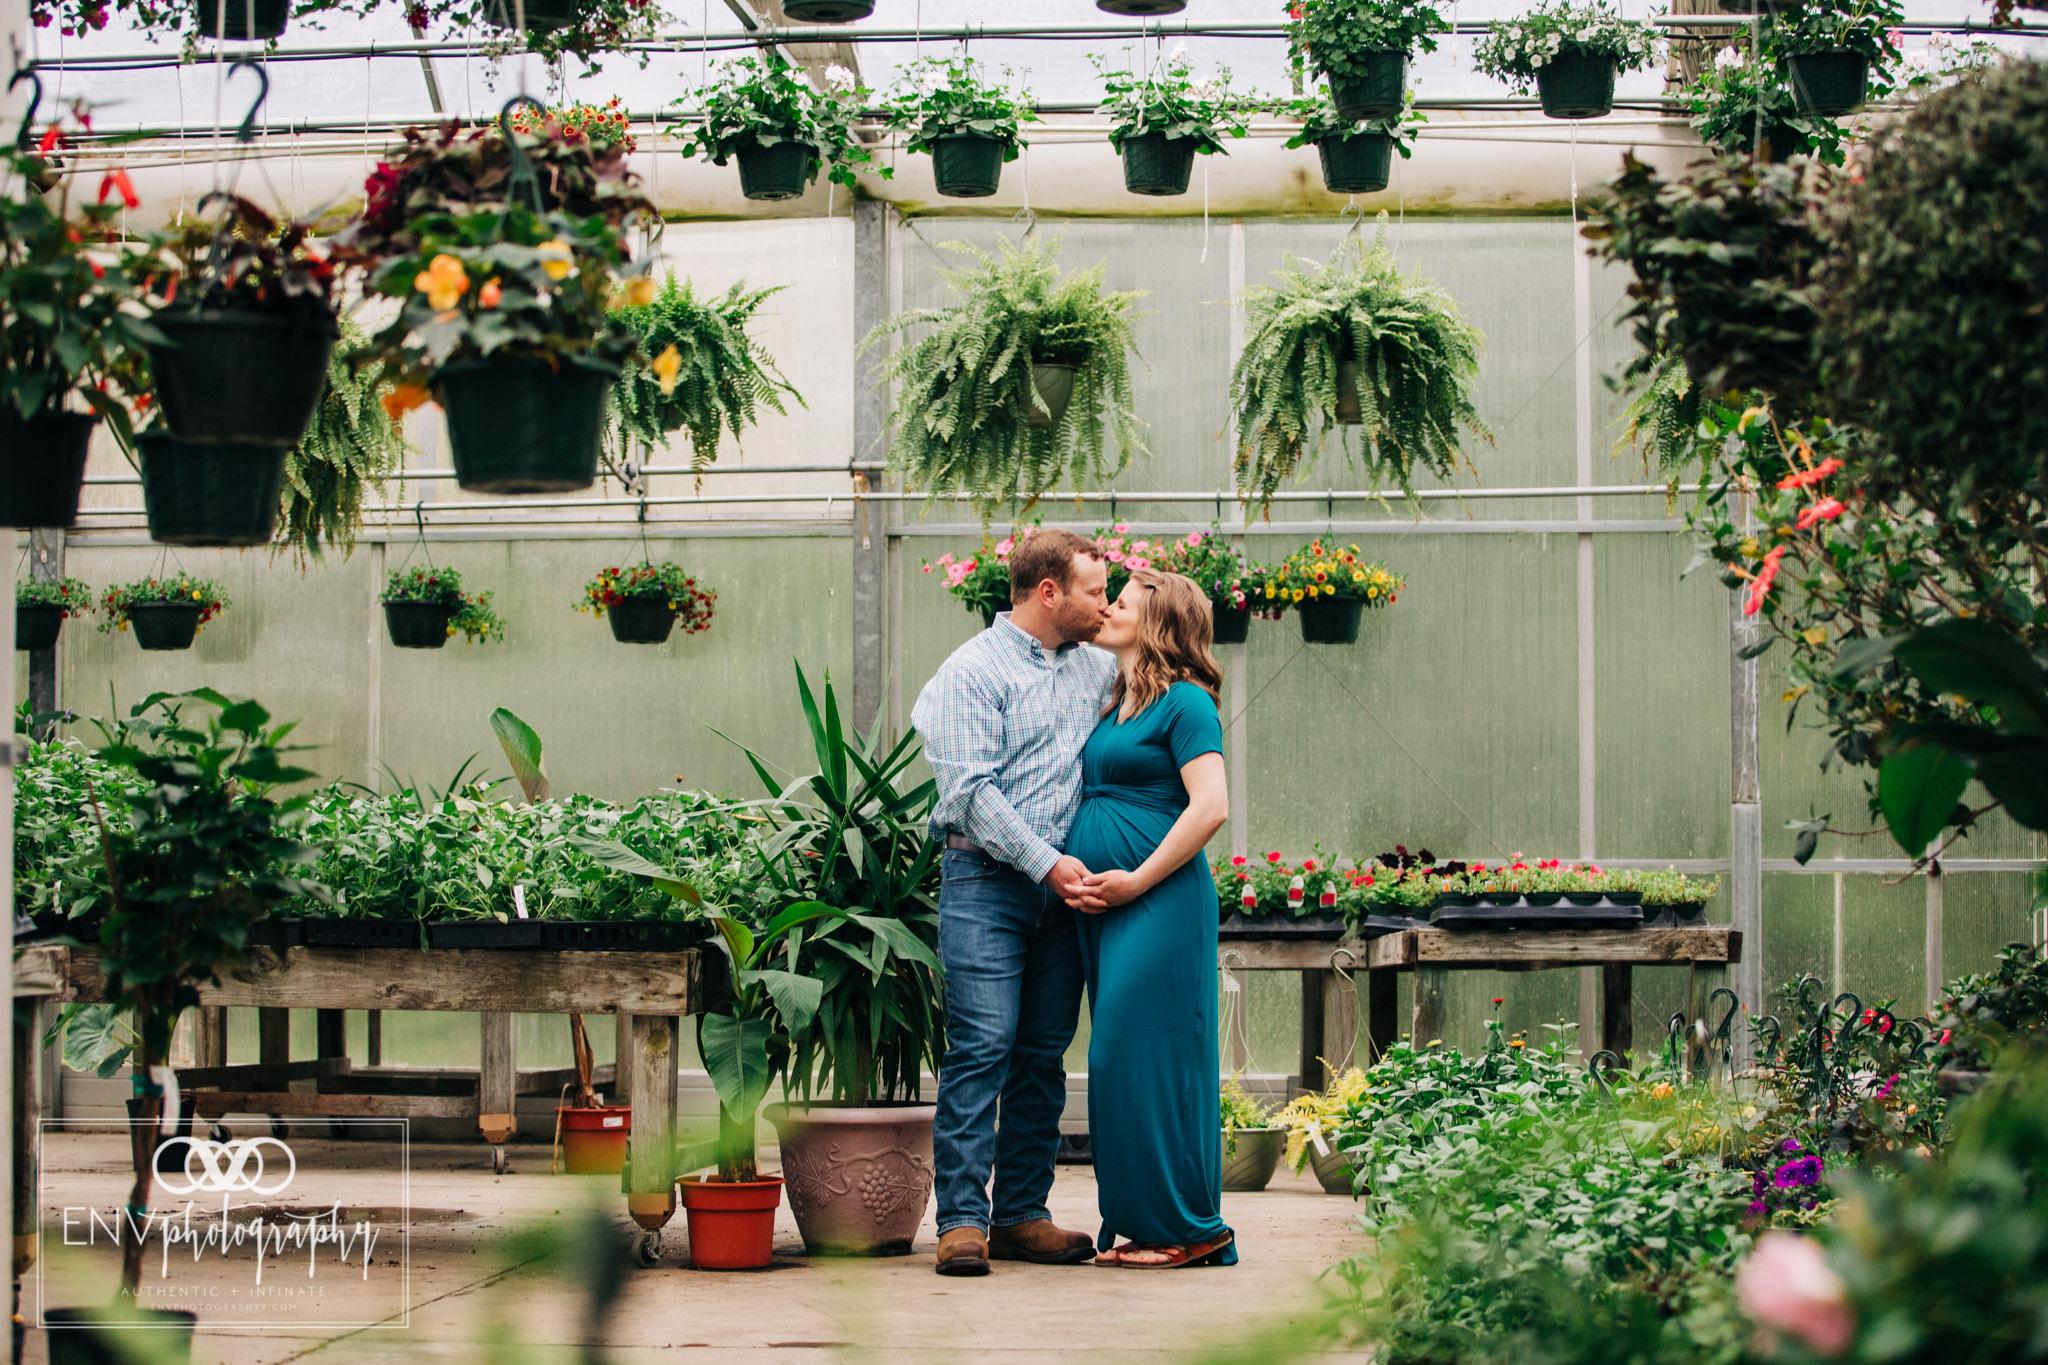 mount vernon columbus mansfield ohio maternity newborn photographer mohican gardens (11).jpg